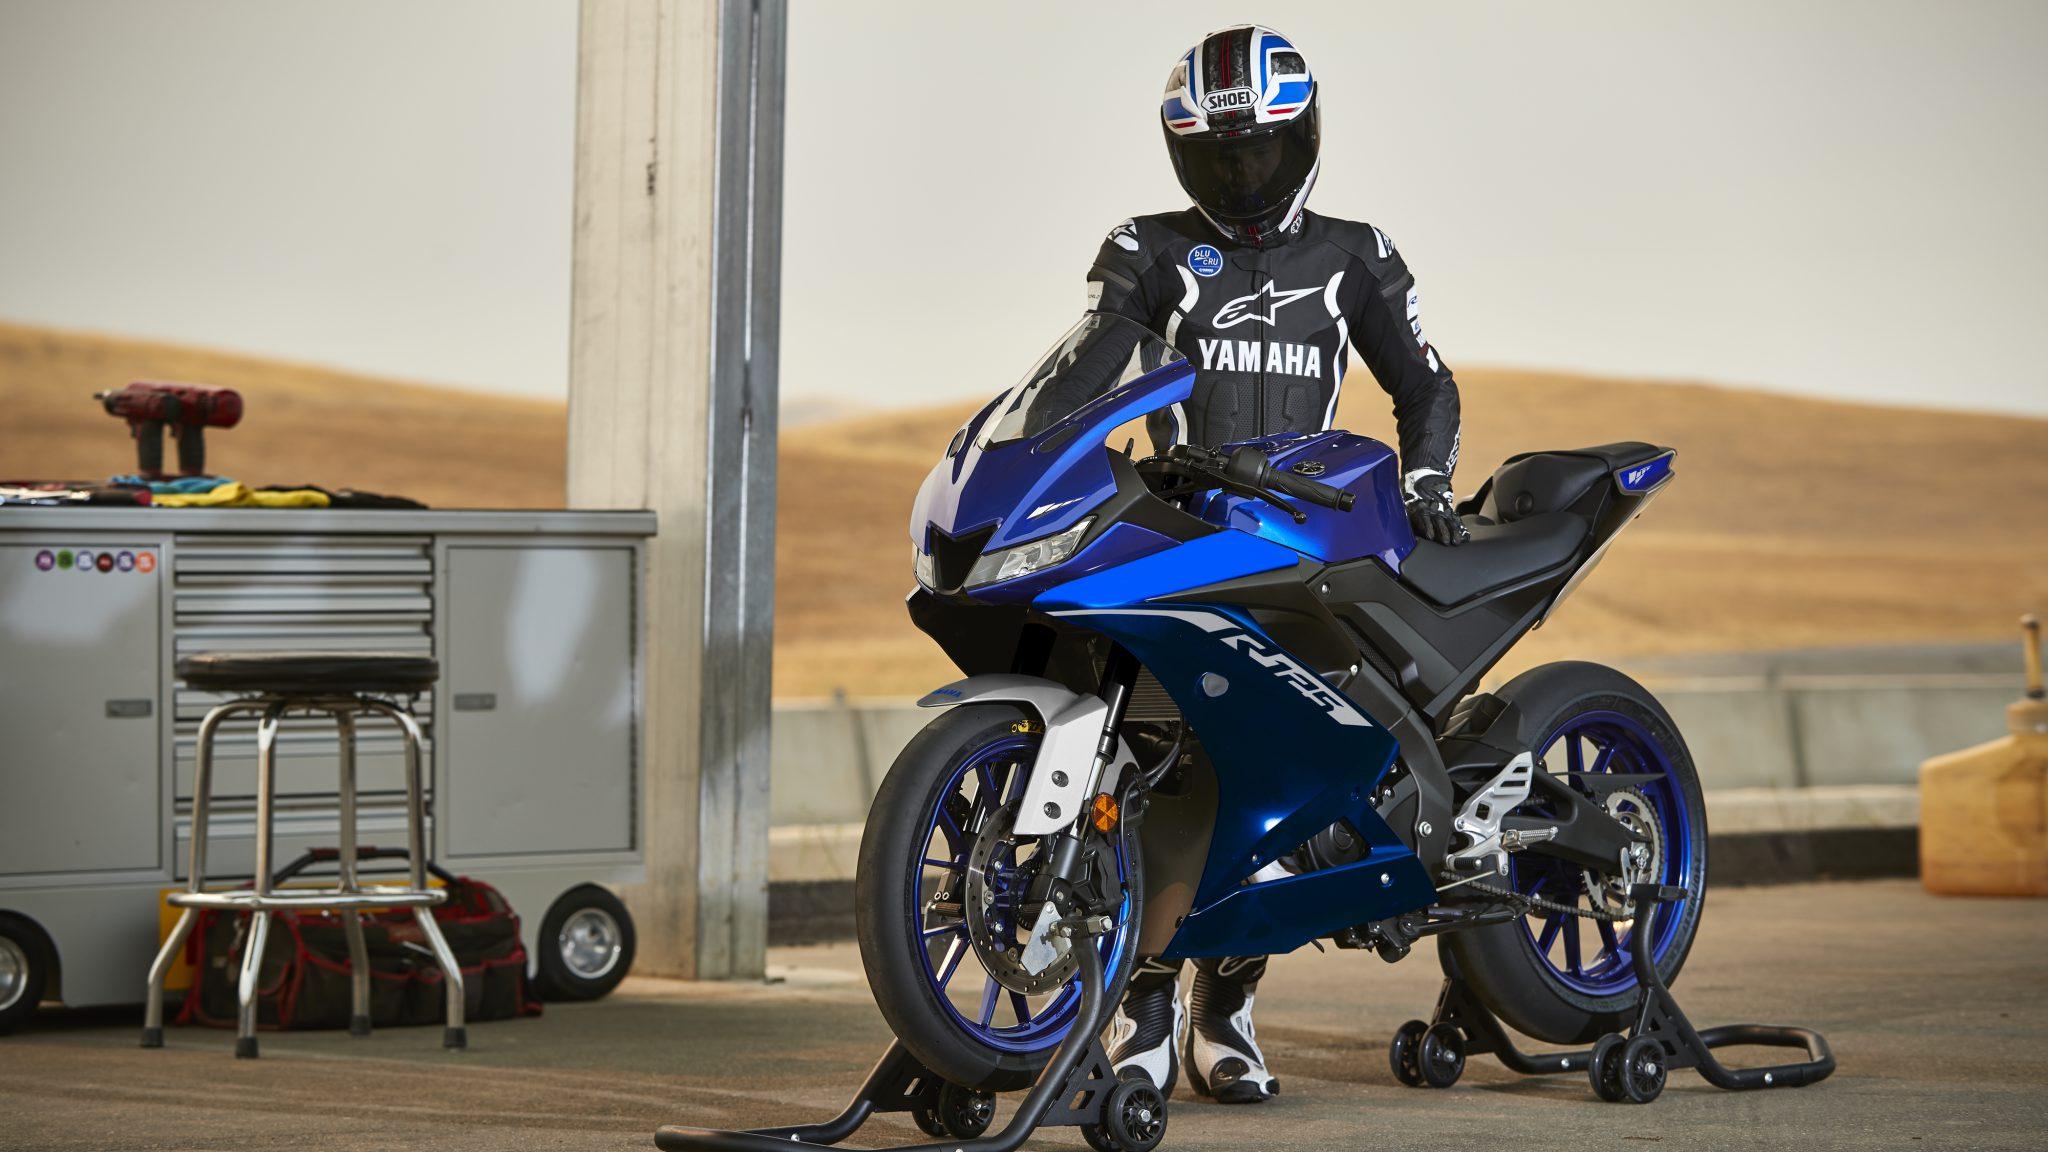 Nieuwe 2020 kleuren Yamaha YZF-R125, YZF-R3 en YZF-R6